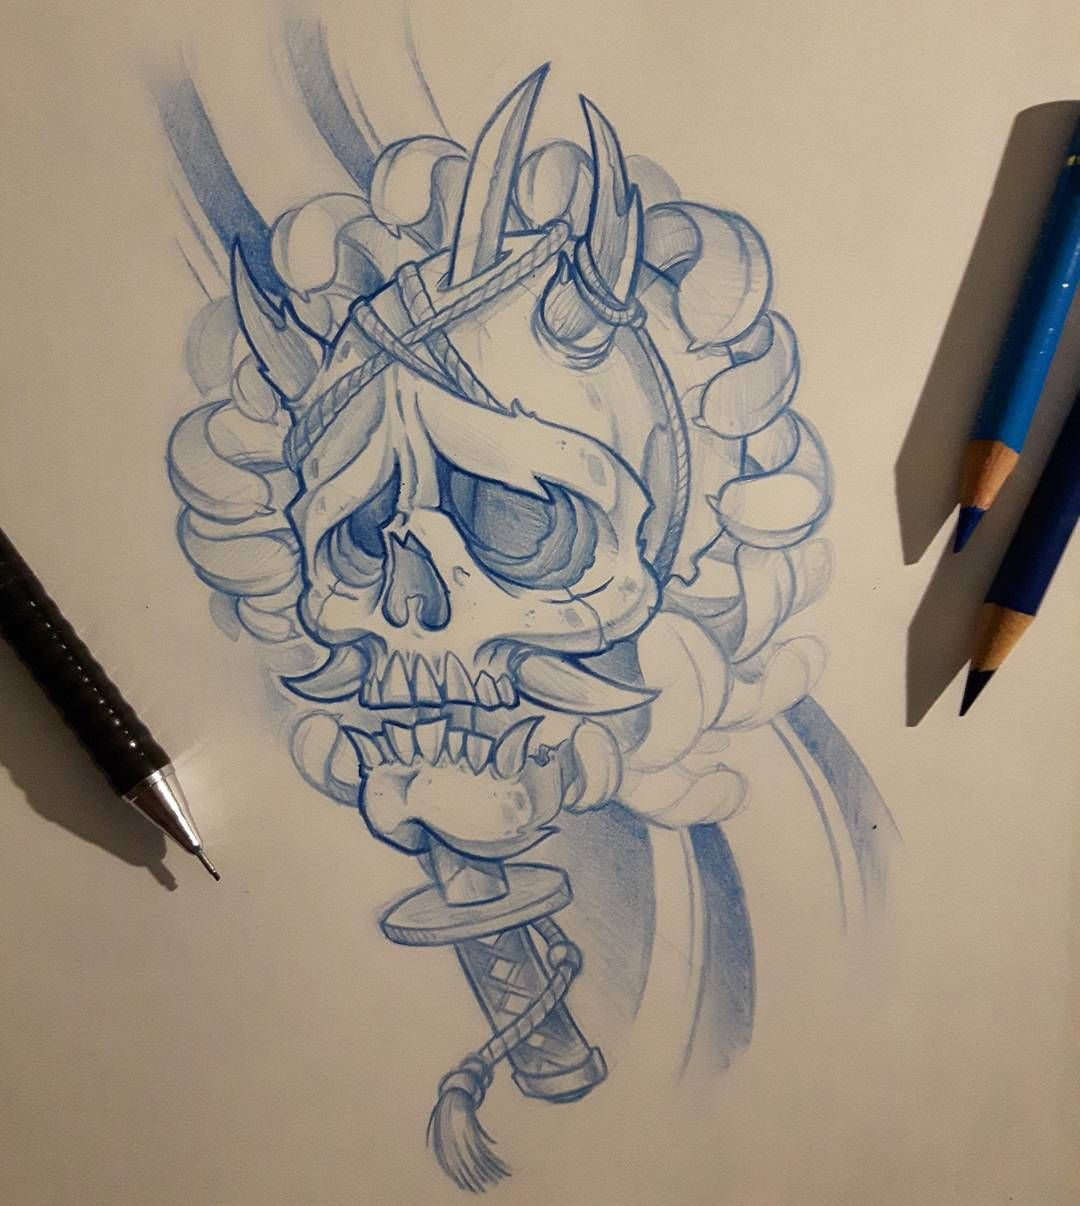 Tattoo Ideas To Draw: Pin By Michael Sawangsangsai On Sketch